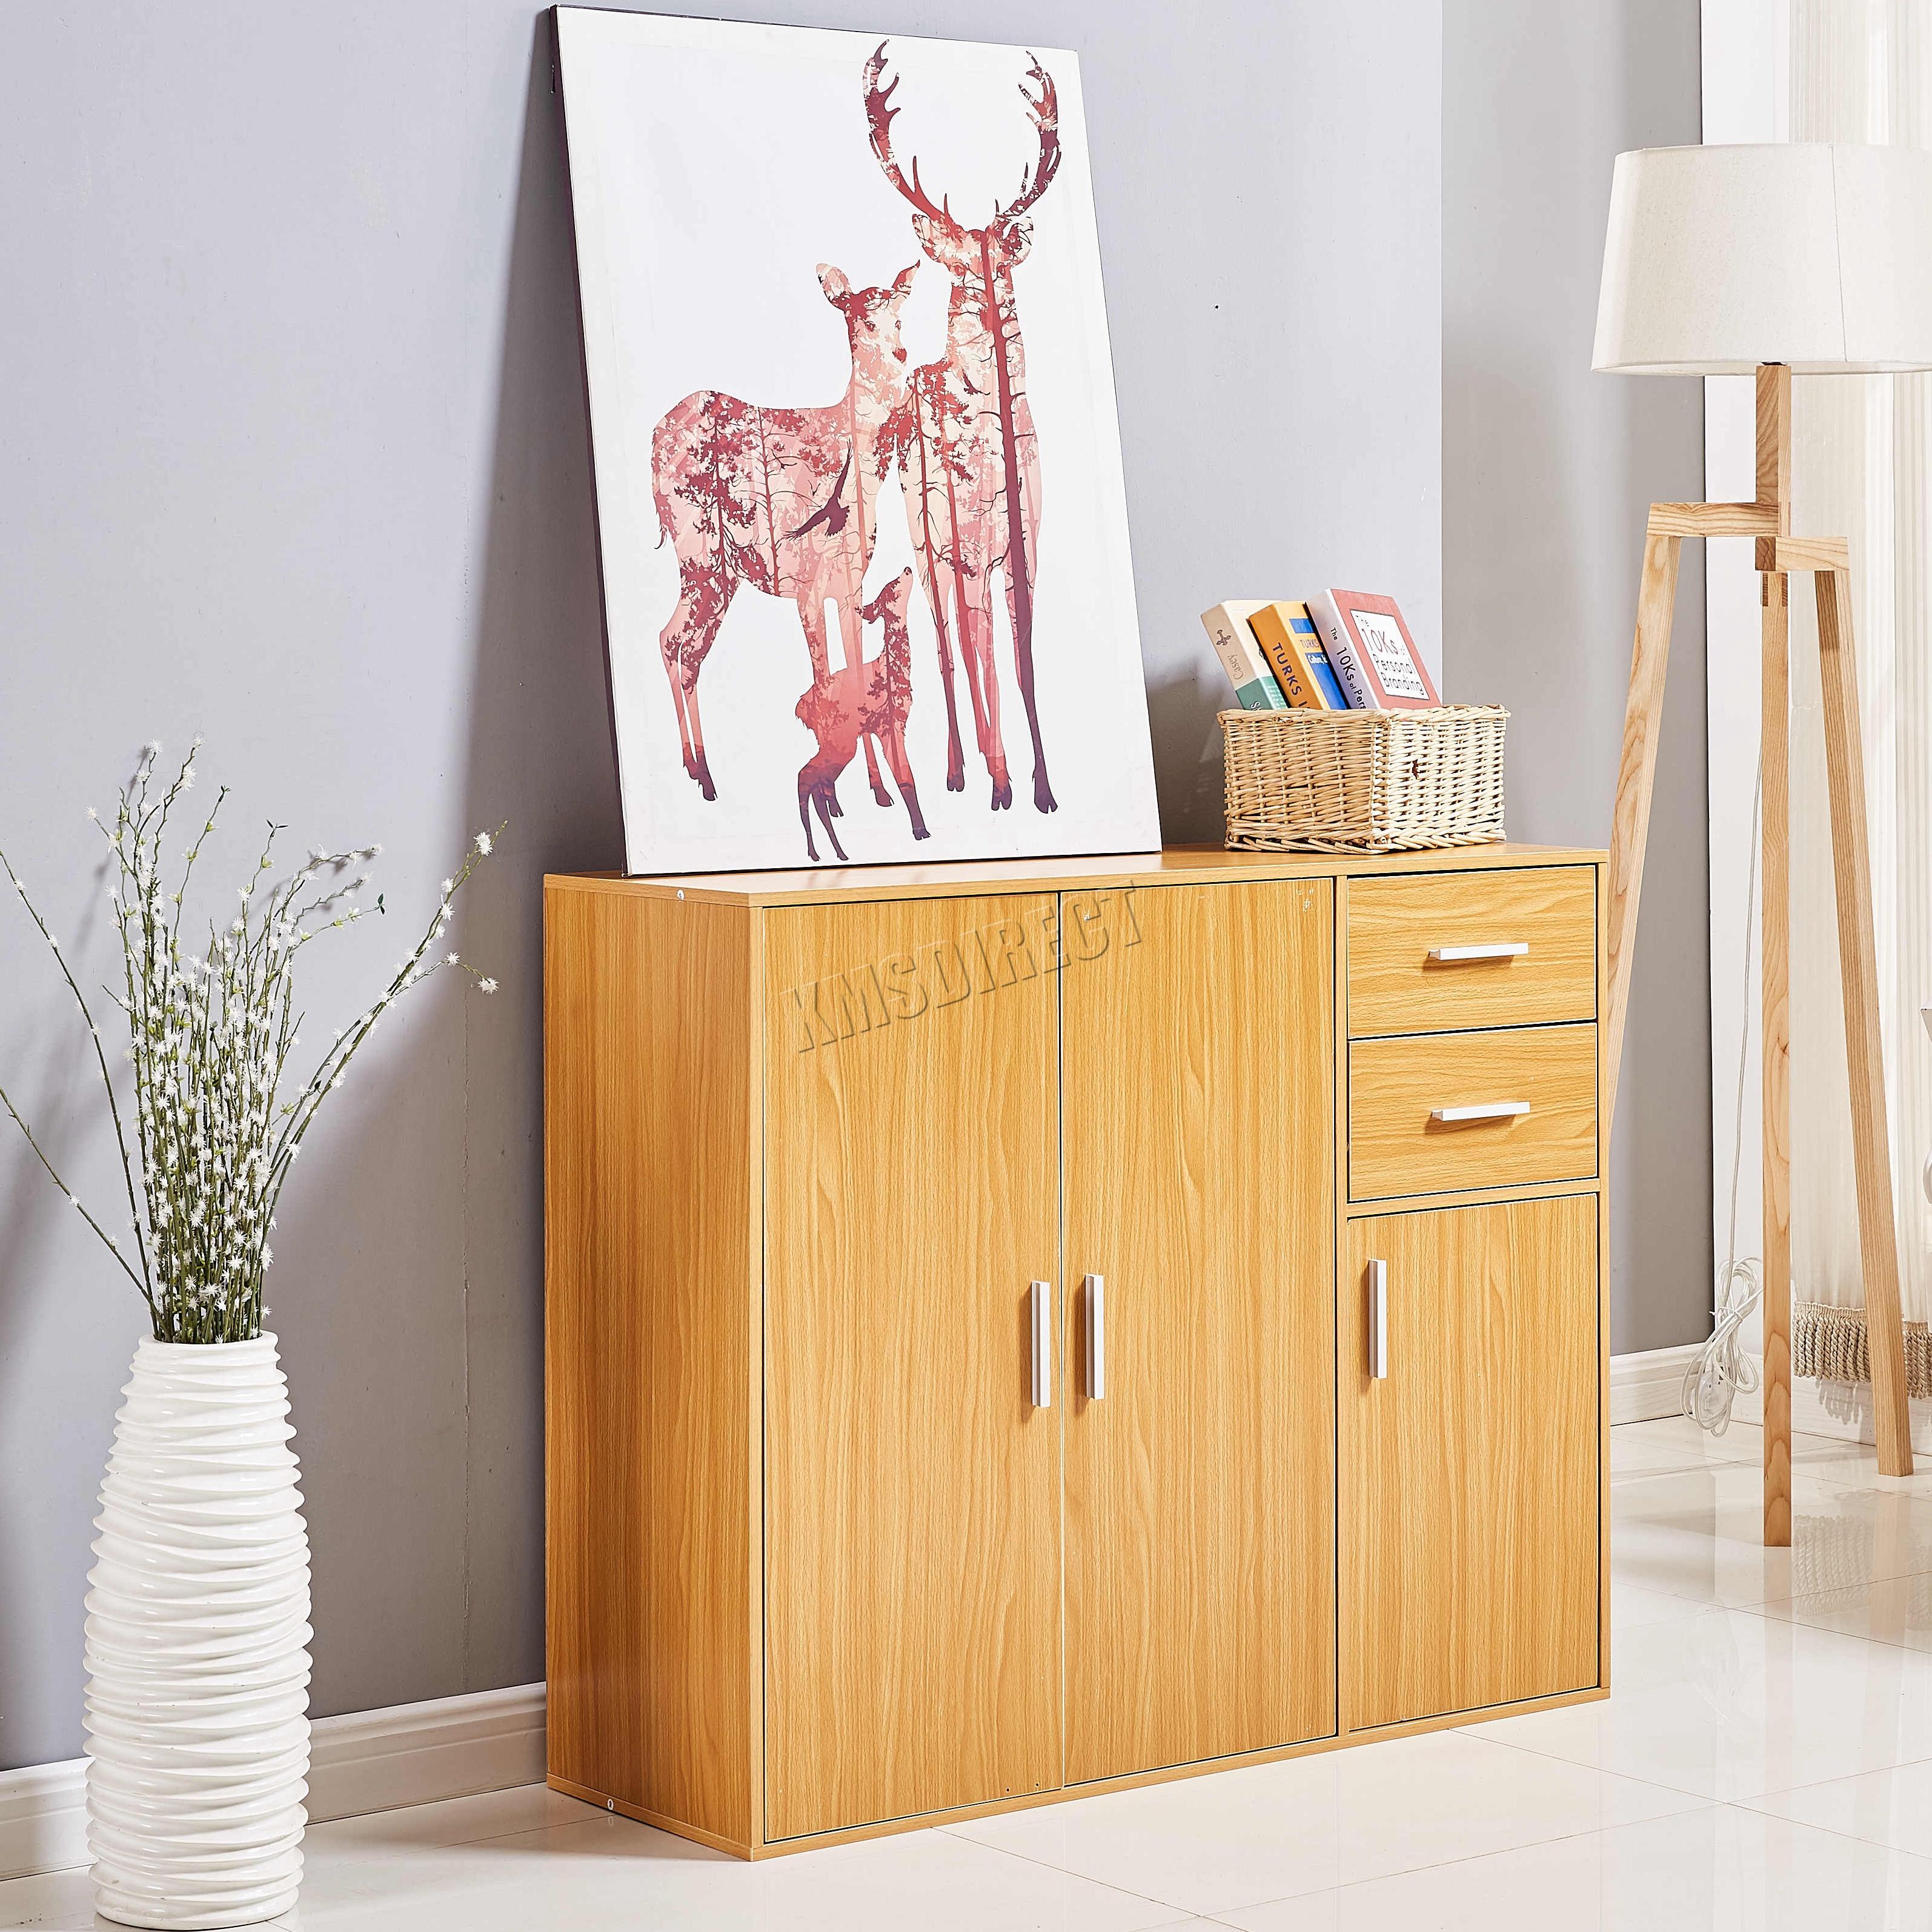 ersatzteile reparatur foxhunter kommode schrank. Black Bedroom Furniture Sets. Home Design Ideas